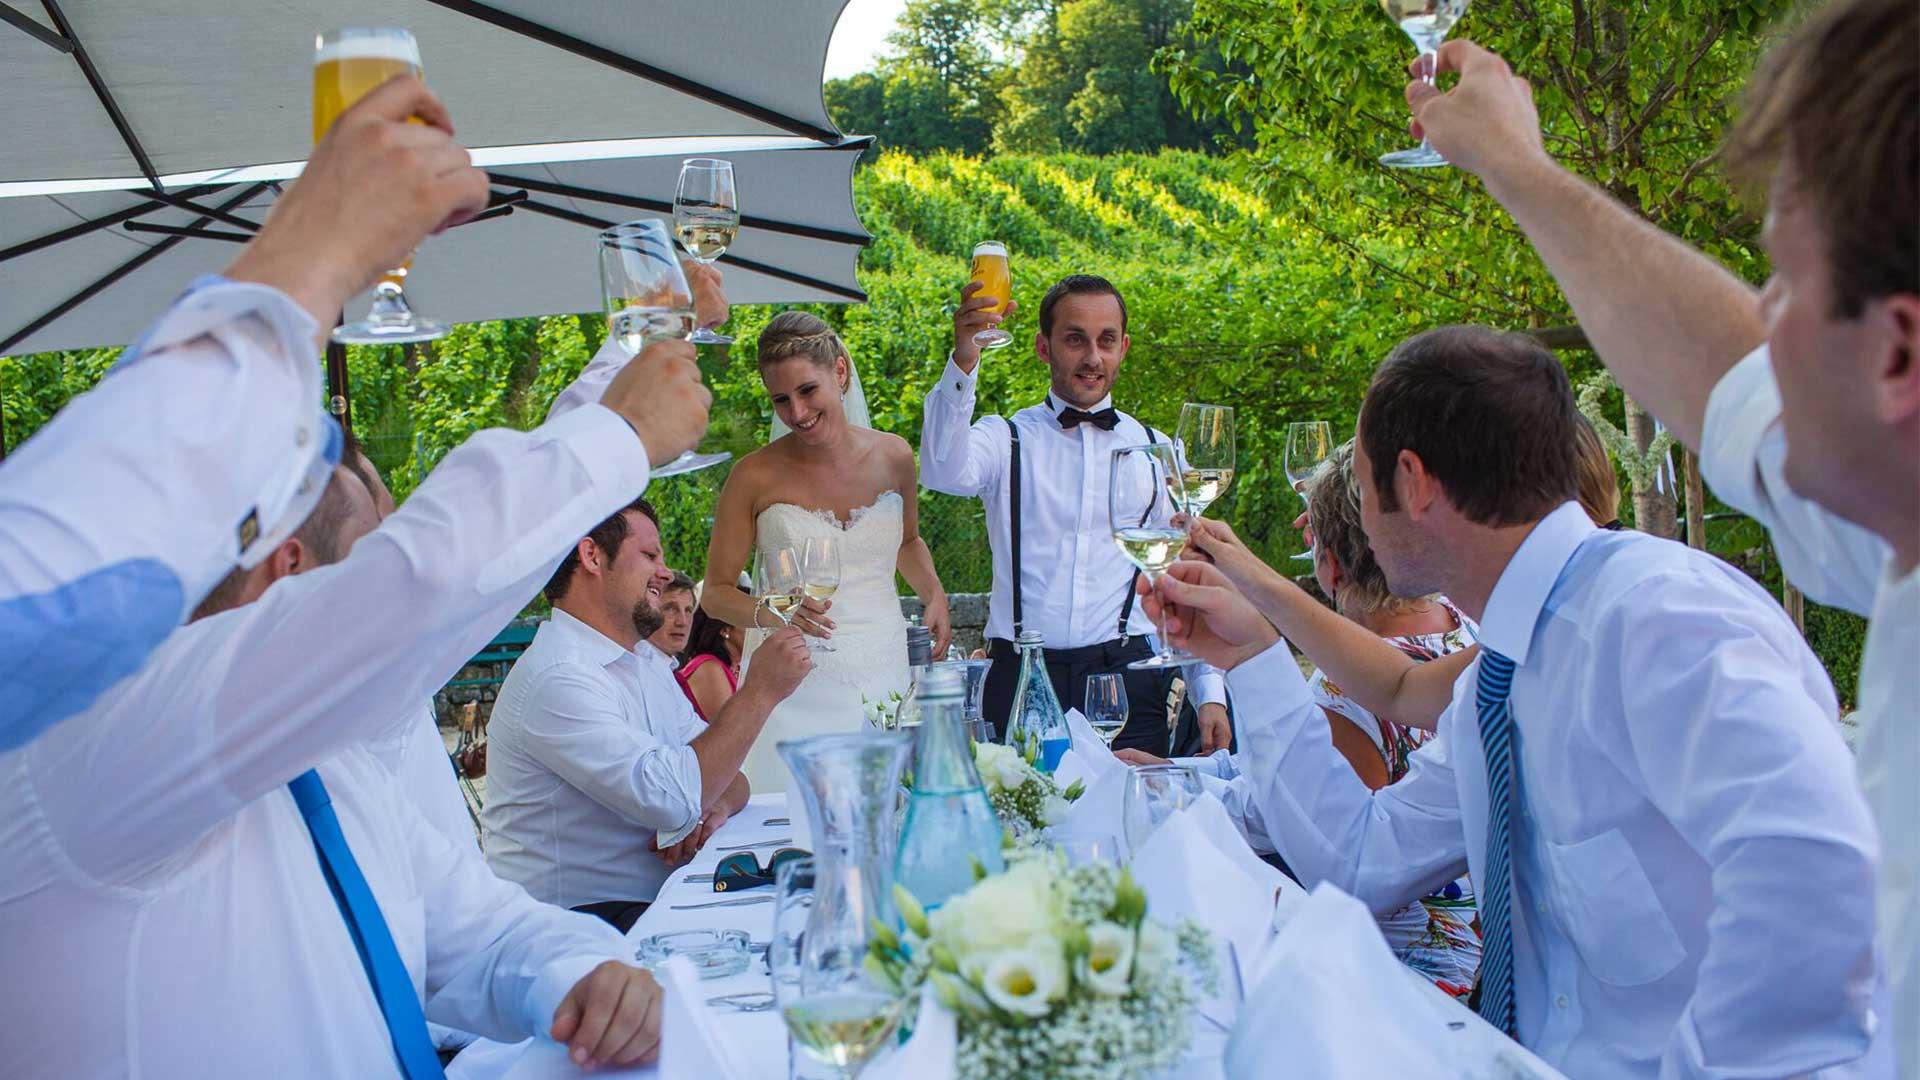 Hochzeitspaar am feiern